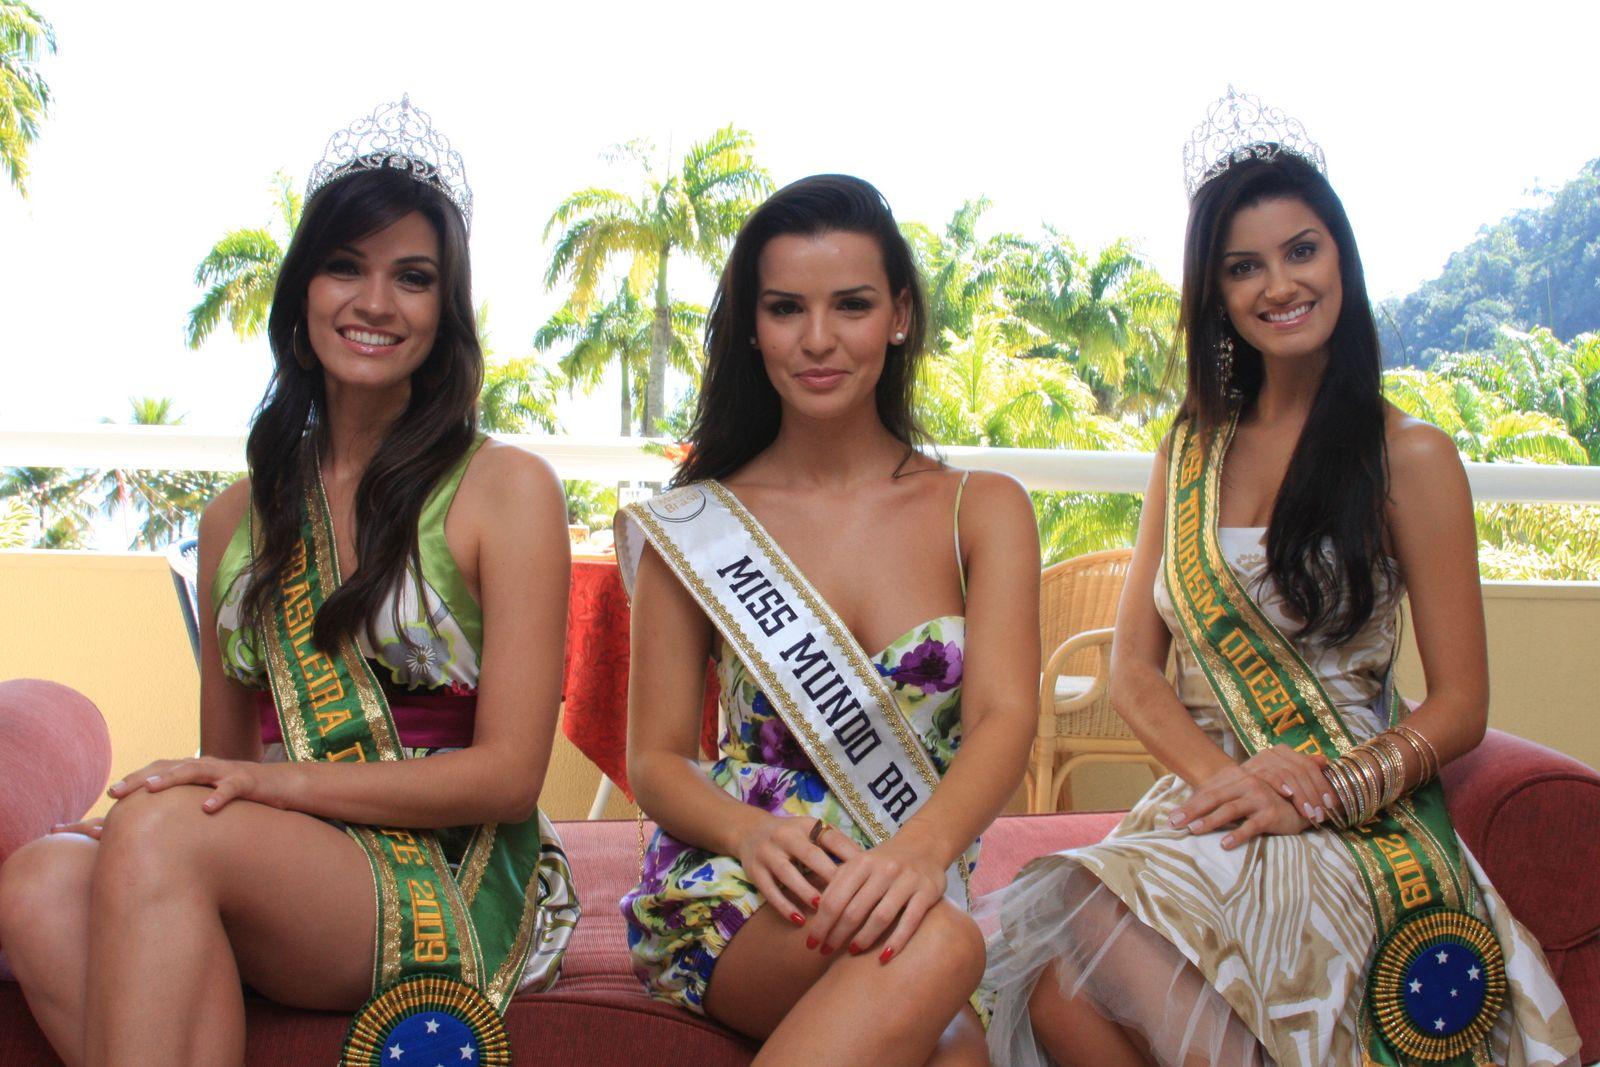 vivian noronha, rainha hispanoamericana 2008. suplente. - Página 2 Rvdtrhfs